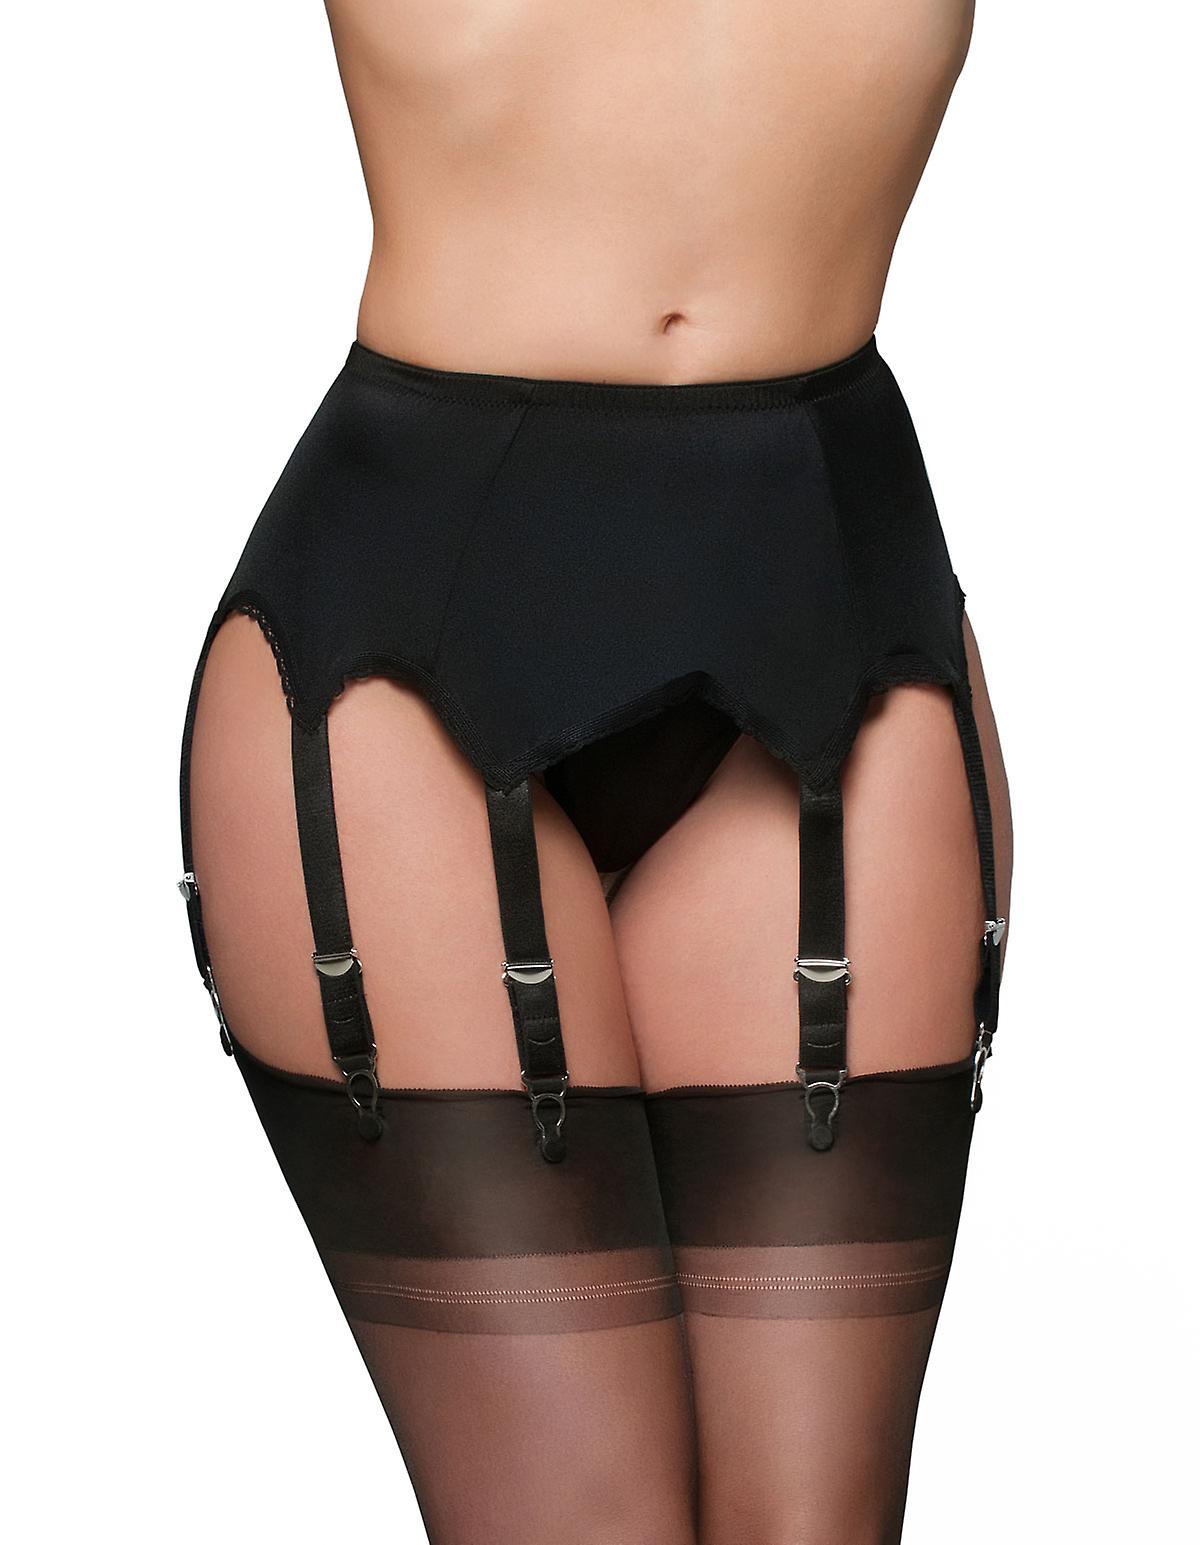 Nylon Dreams NDL3 Women's Garter Belt 8 Strap Suspender Belt